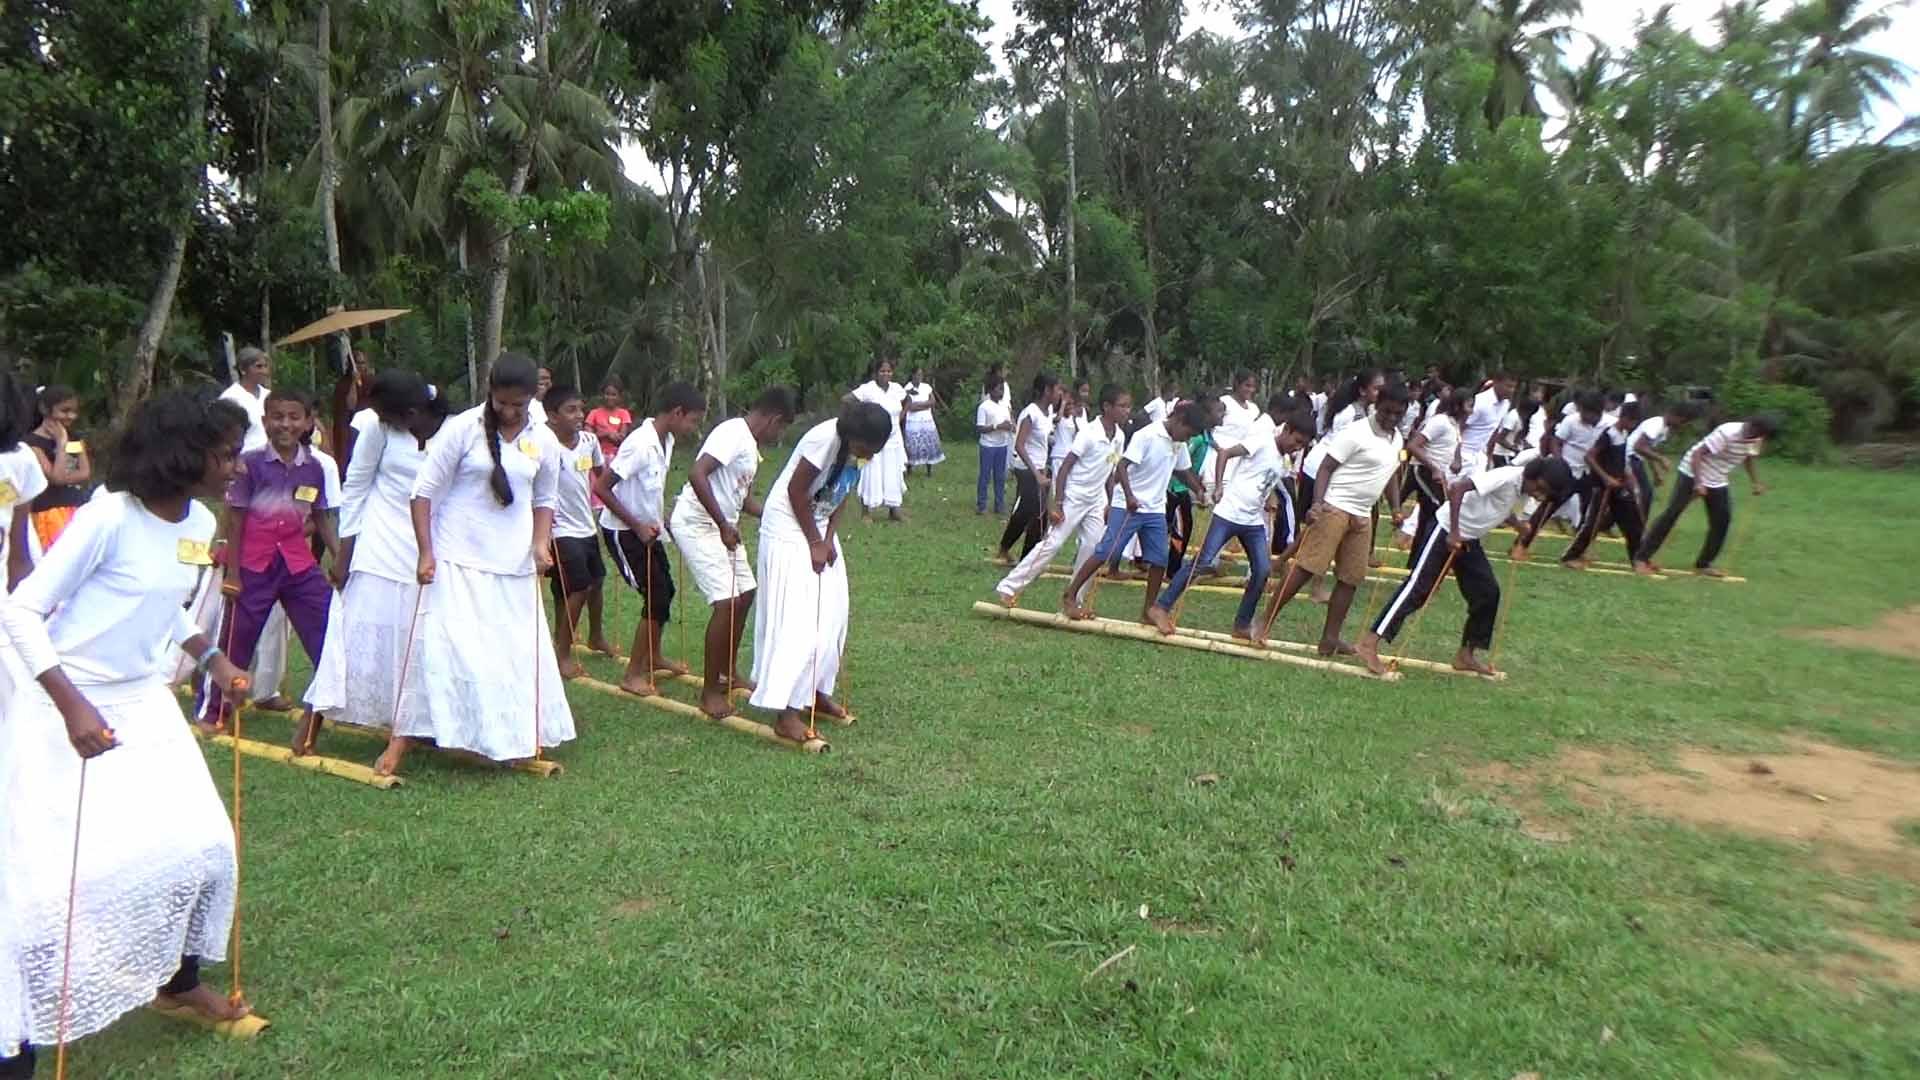 Sati Pasala Mindfulness Camp at Meethirigala Kanishta Vidyalaya-mindful games (13)